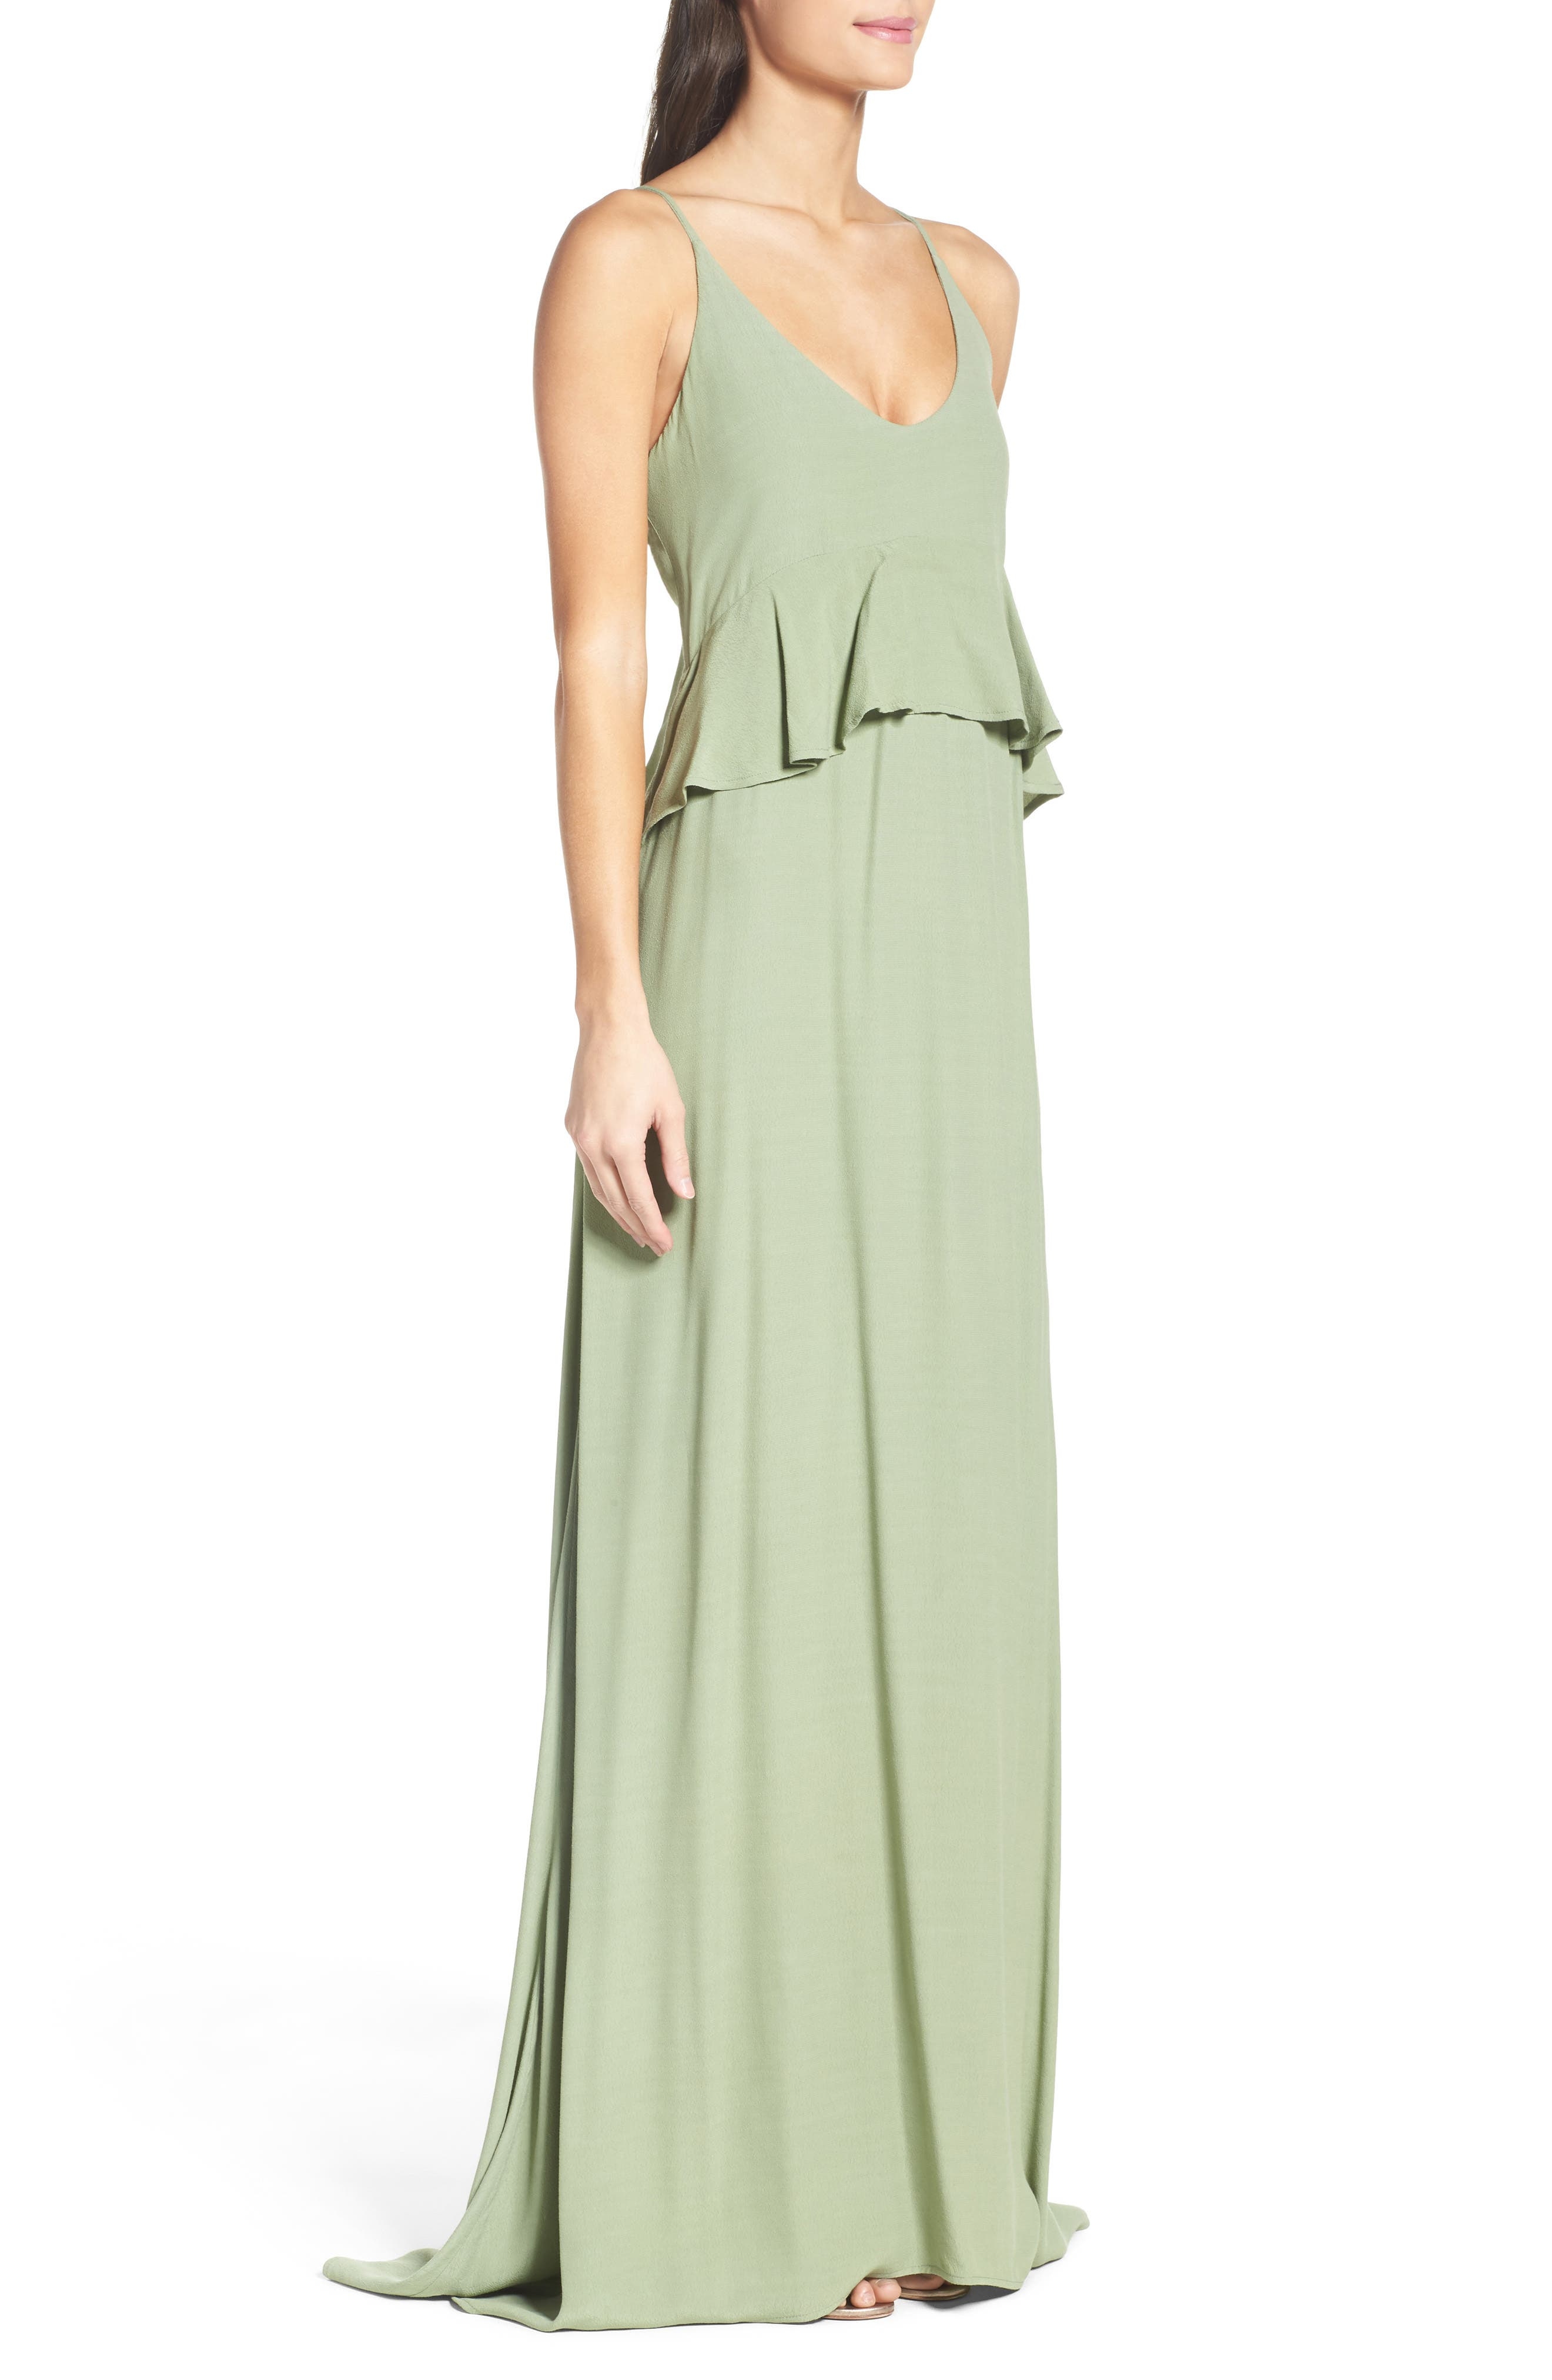 Roe + May Jolie Crepe Peplum Dress,                             Alternate thumbnail 3, color,                             Sage